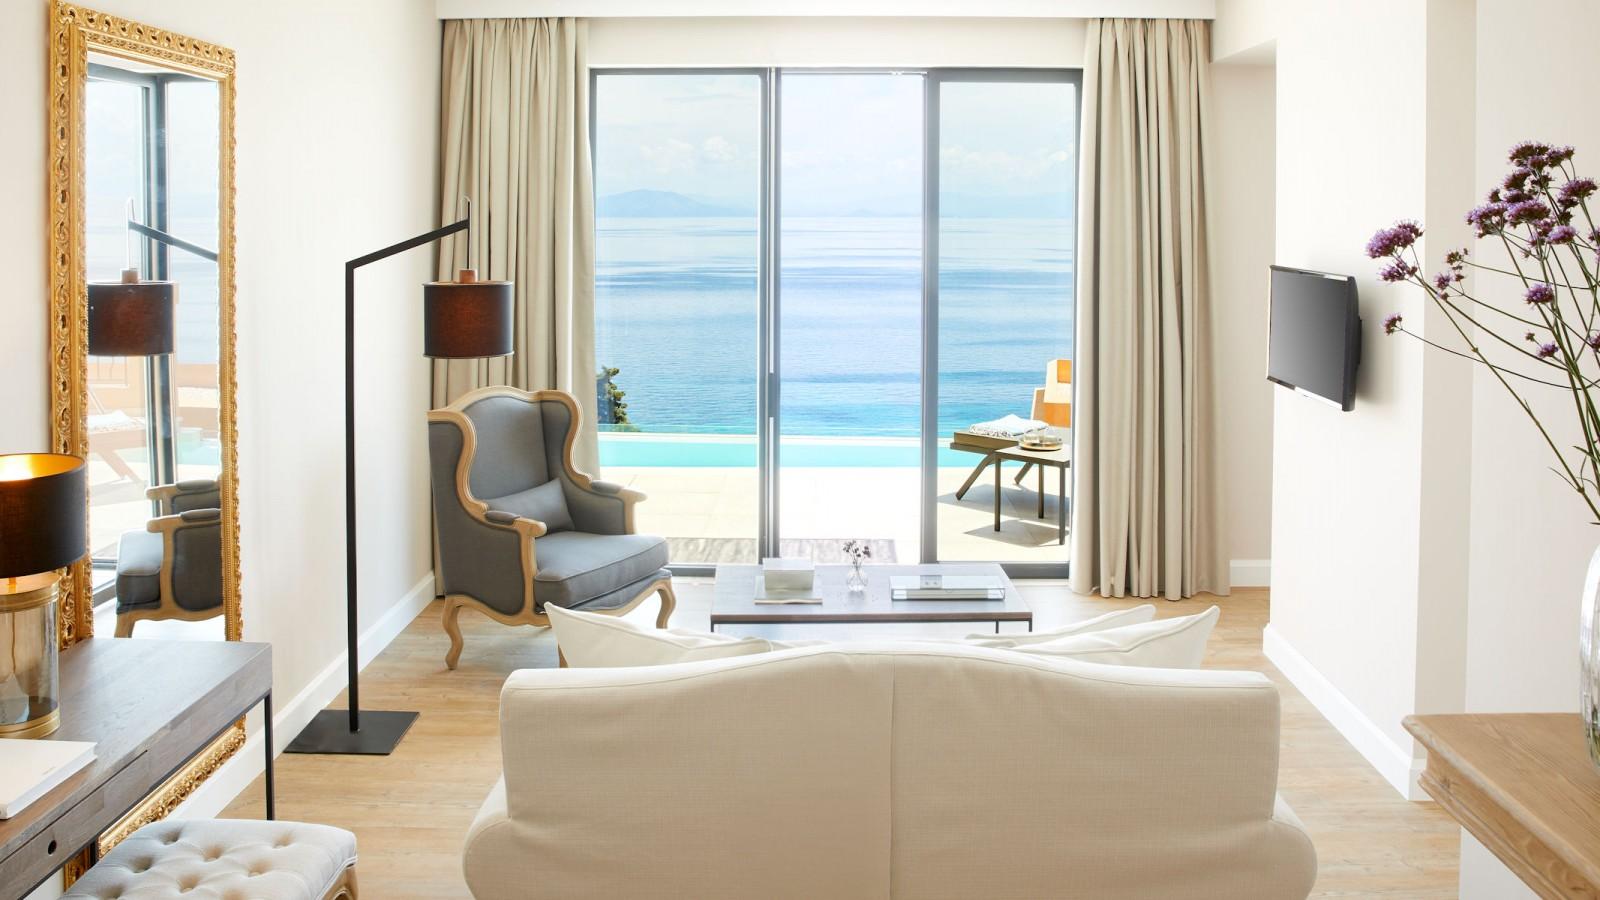 MarBella Nido Deluxe Suite Private Pool